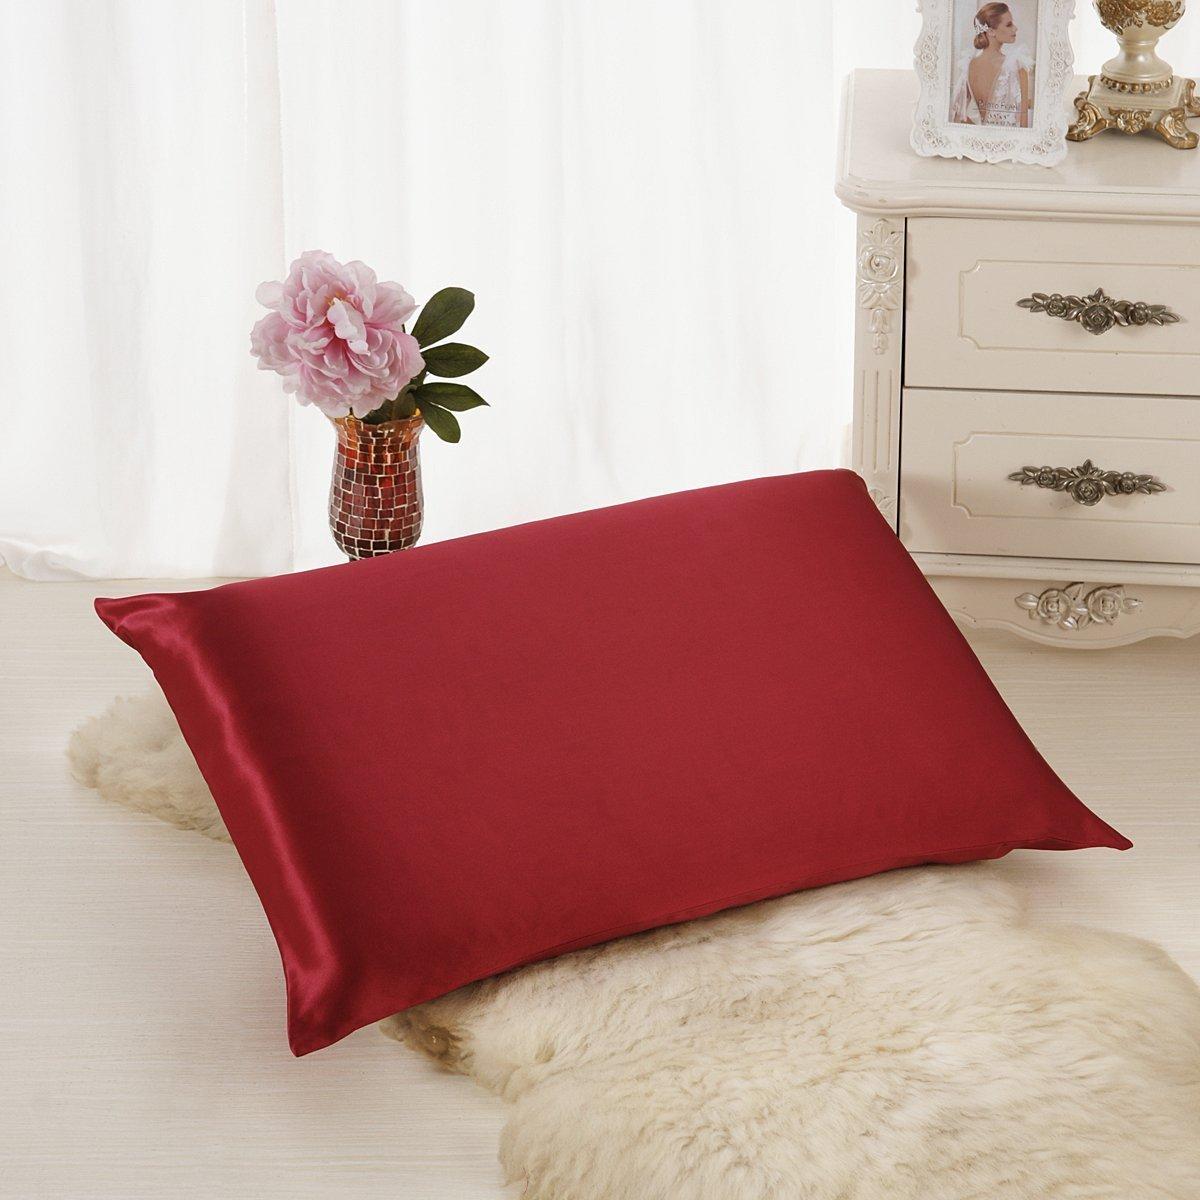 (Standard, Charcoal Gray) ALASKA BEAR Natural Silk Pillowcase, Hypoallergenic, 19 momme, 600 thread count 100 percent Mulberry Silk, Standard Size with hidden zipper (1, Charcoal Grey) B06XJ1D99L 標準,チャコールグレー